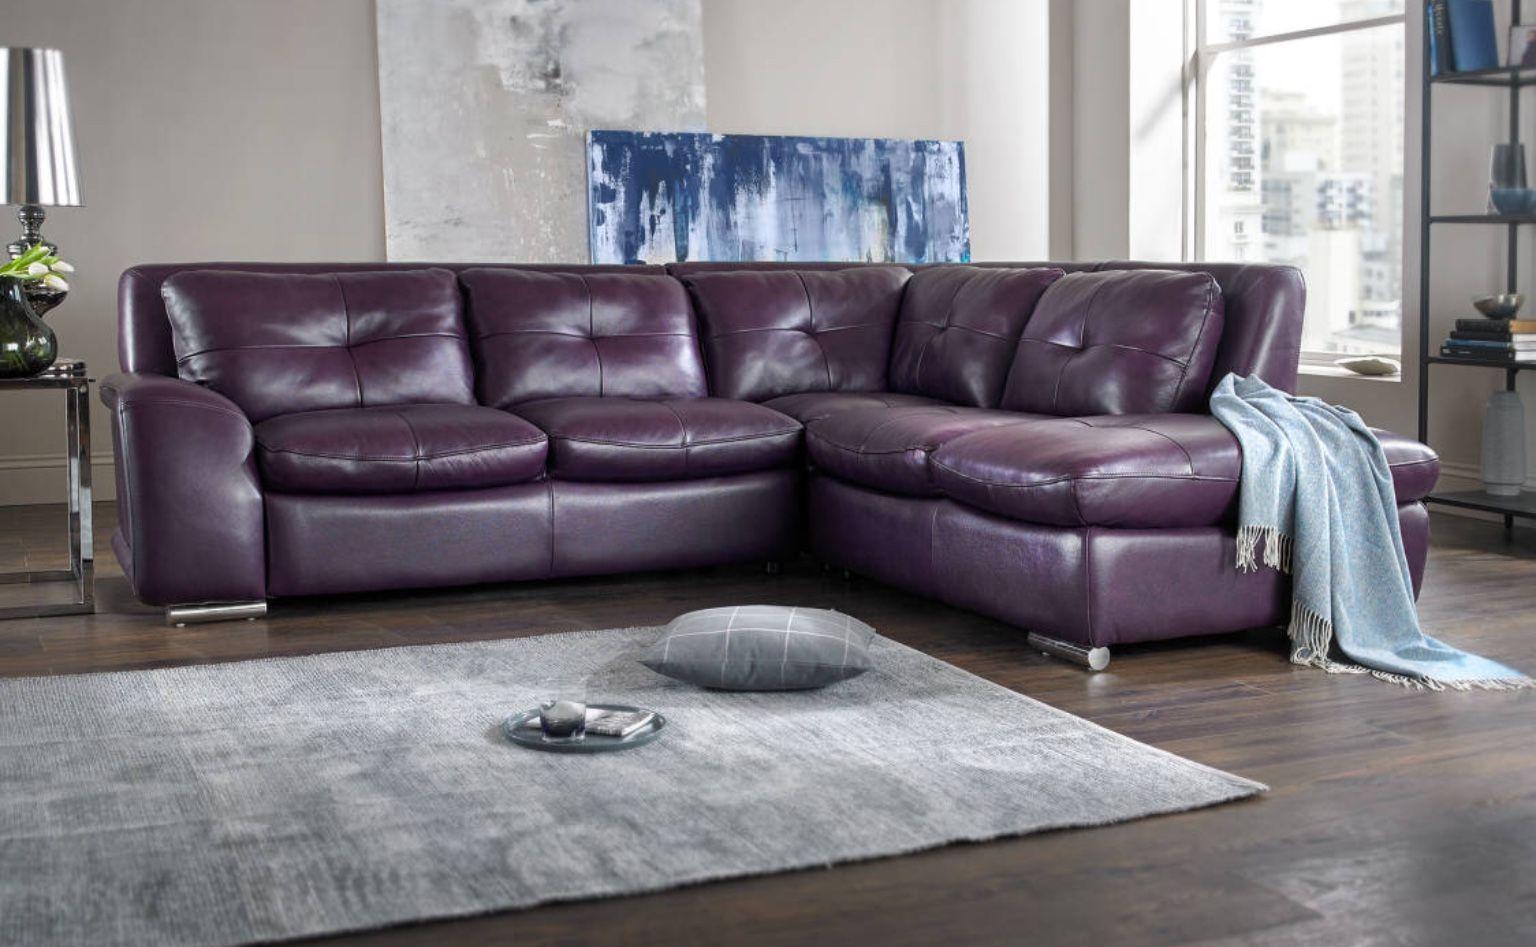 Sofology Felice Sofa In Damson With Grey Interior Leather Sofa